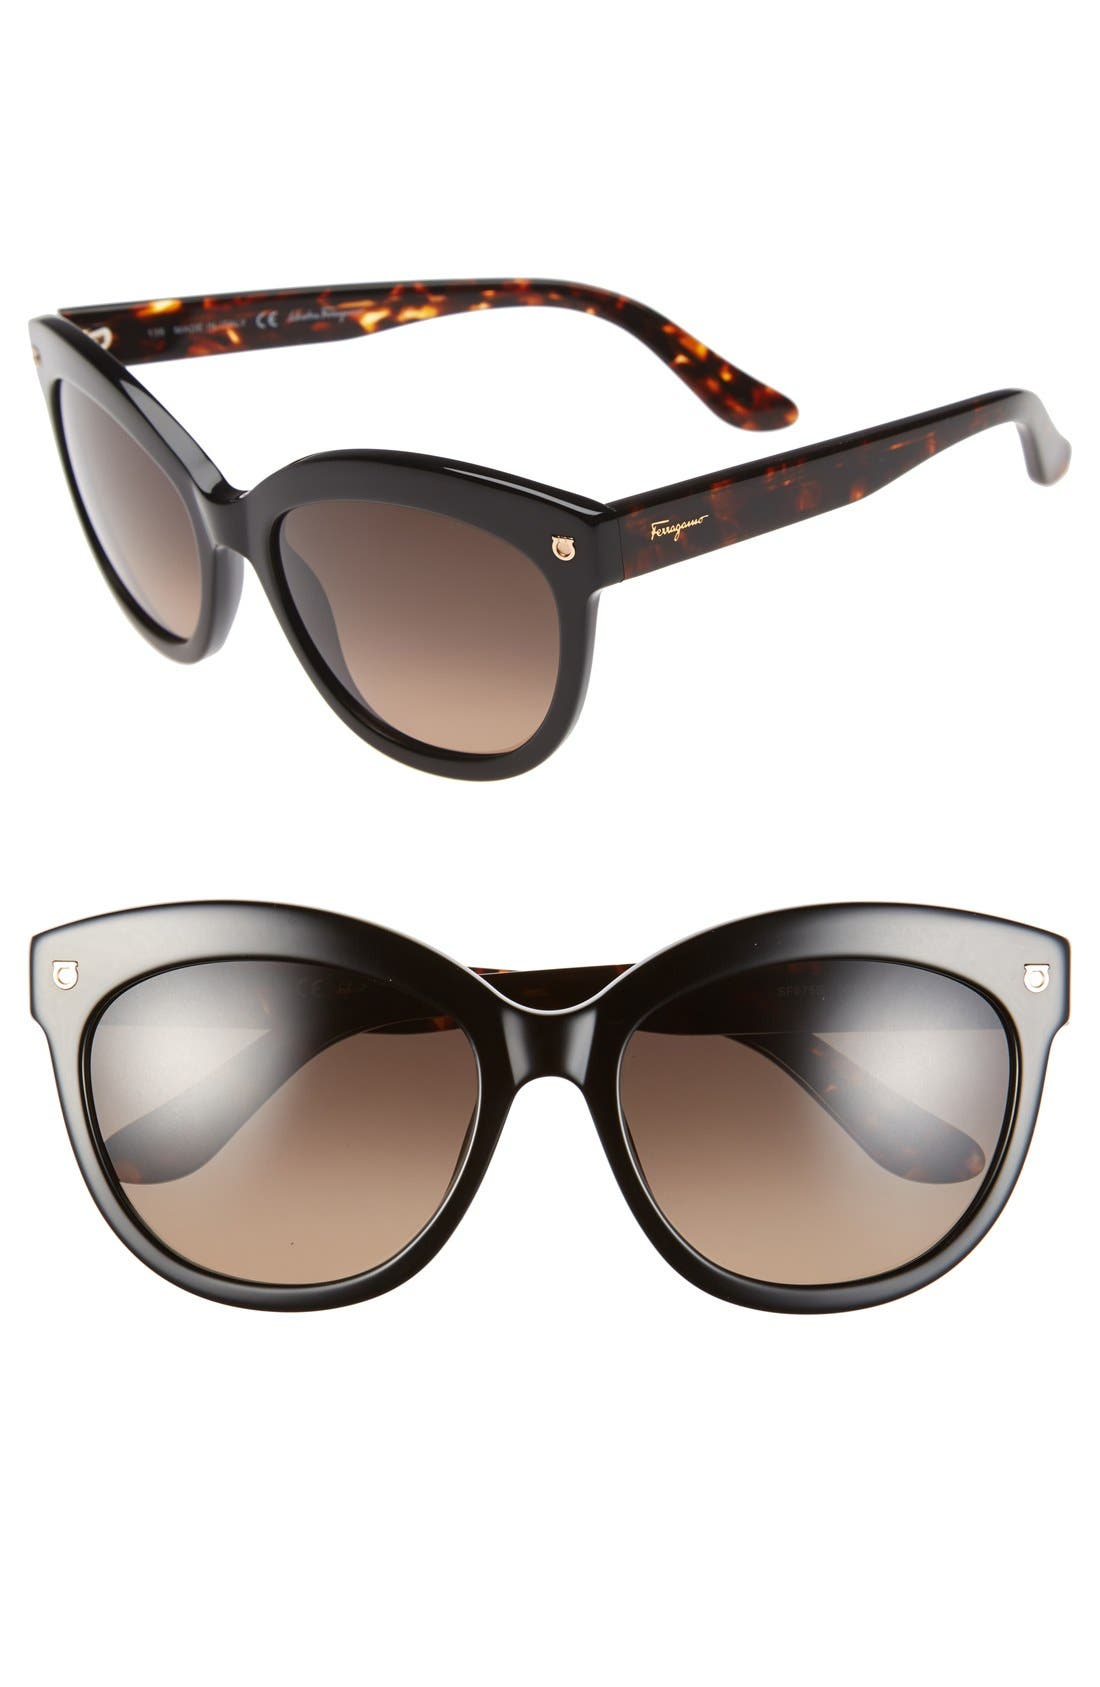 Main Image - Salvatore Ferragamo 'Gancino' 55mm Cat Eye Sunglasses